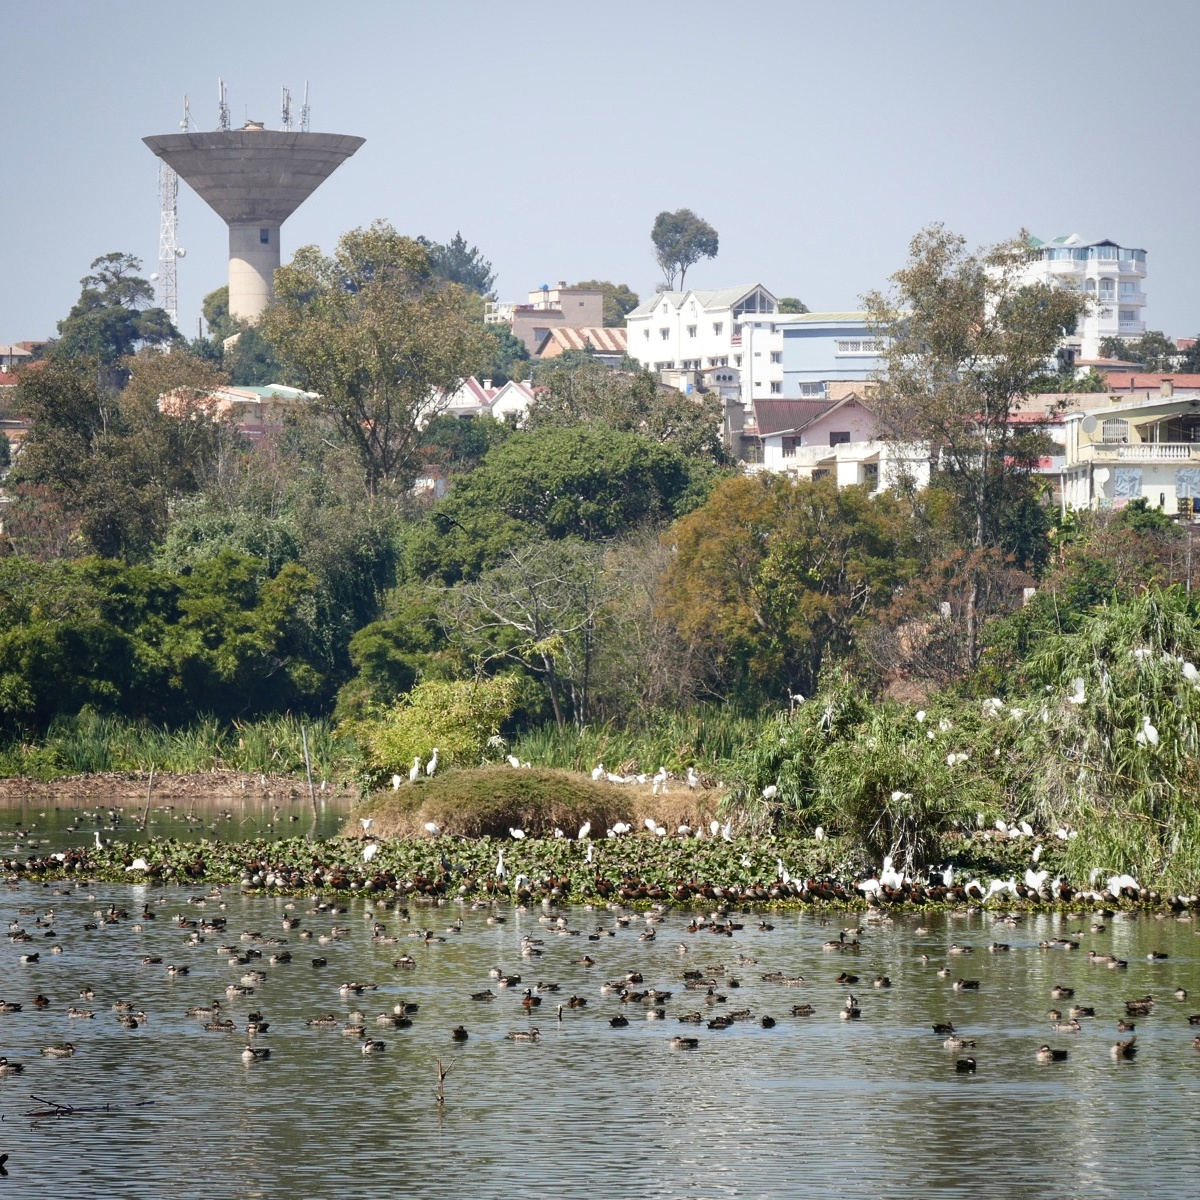 Ducks congregate in an urban park in Antananarivo. Noah Strycker